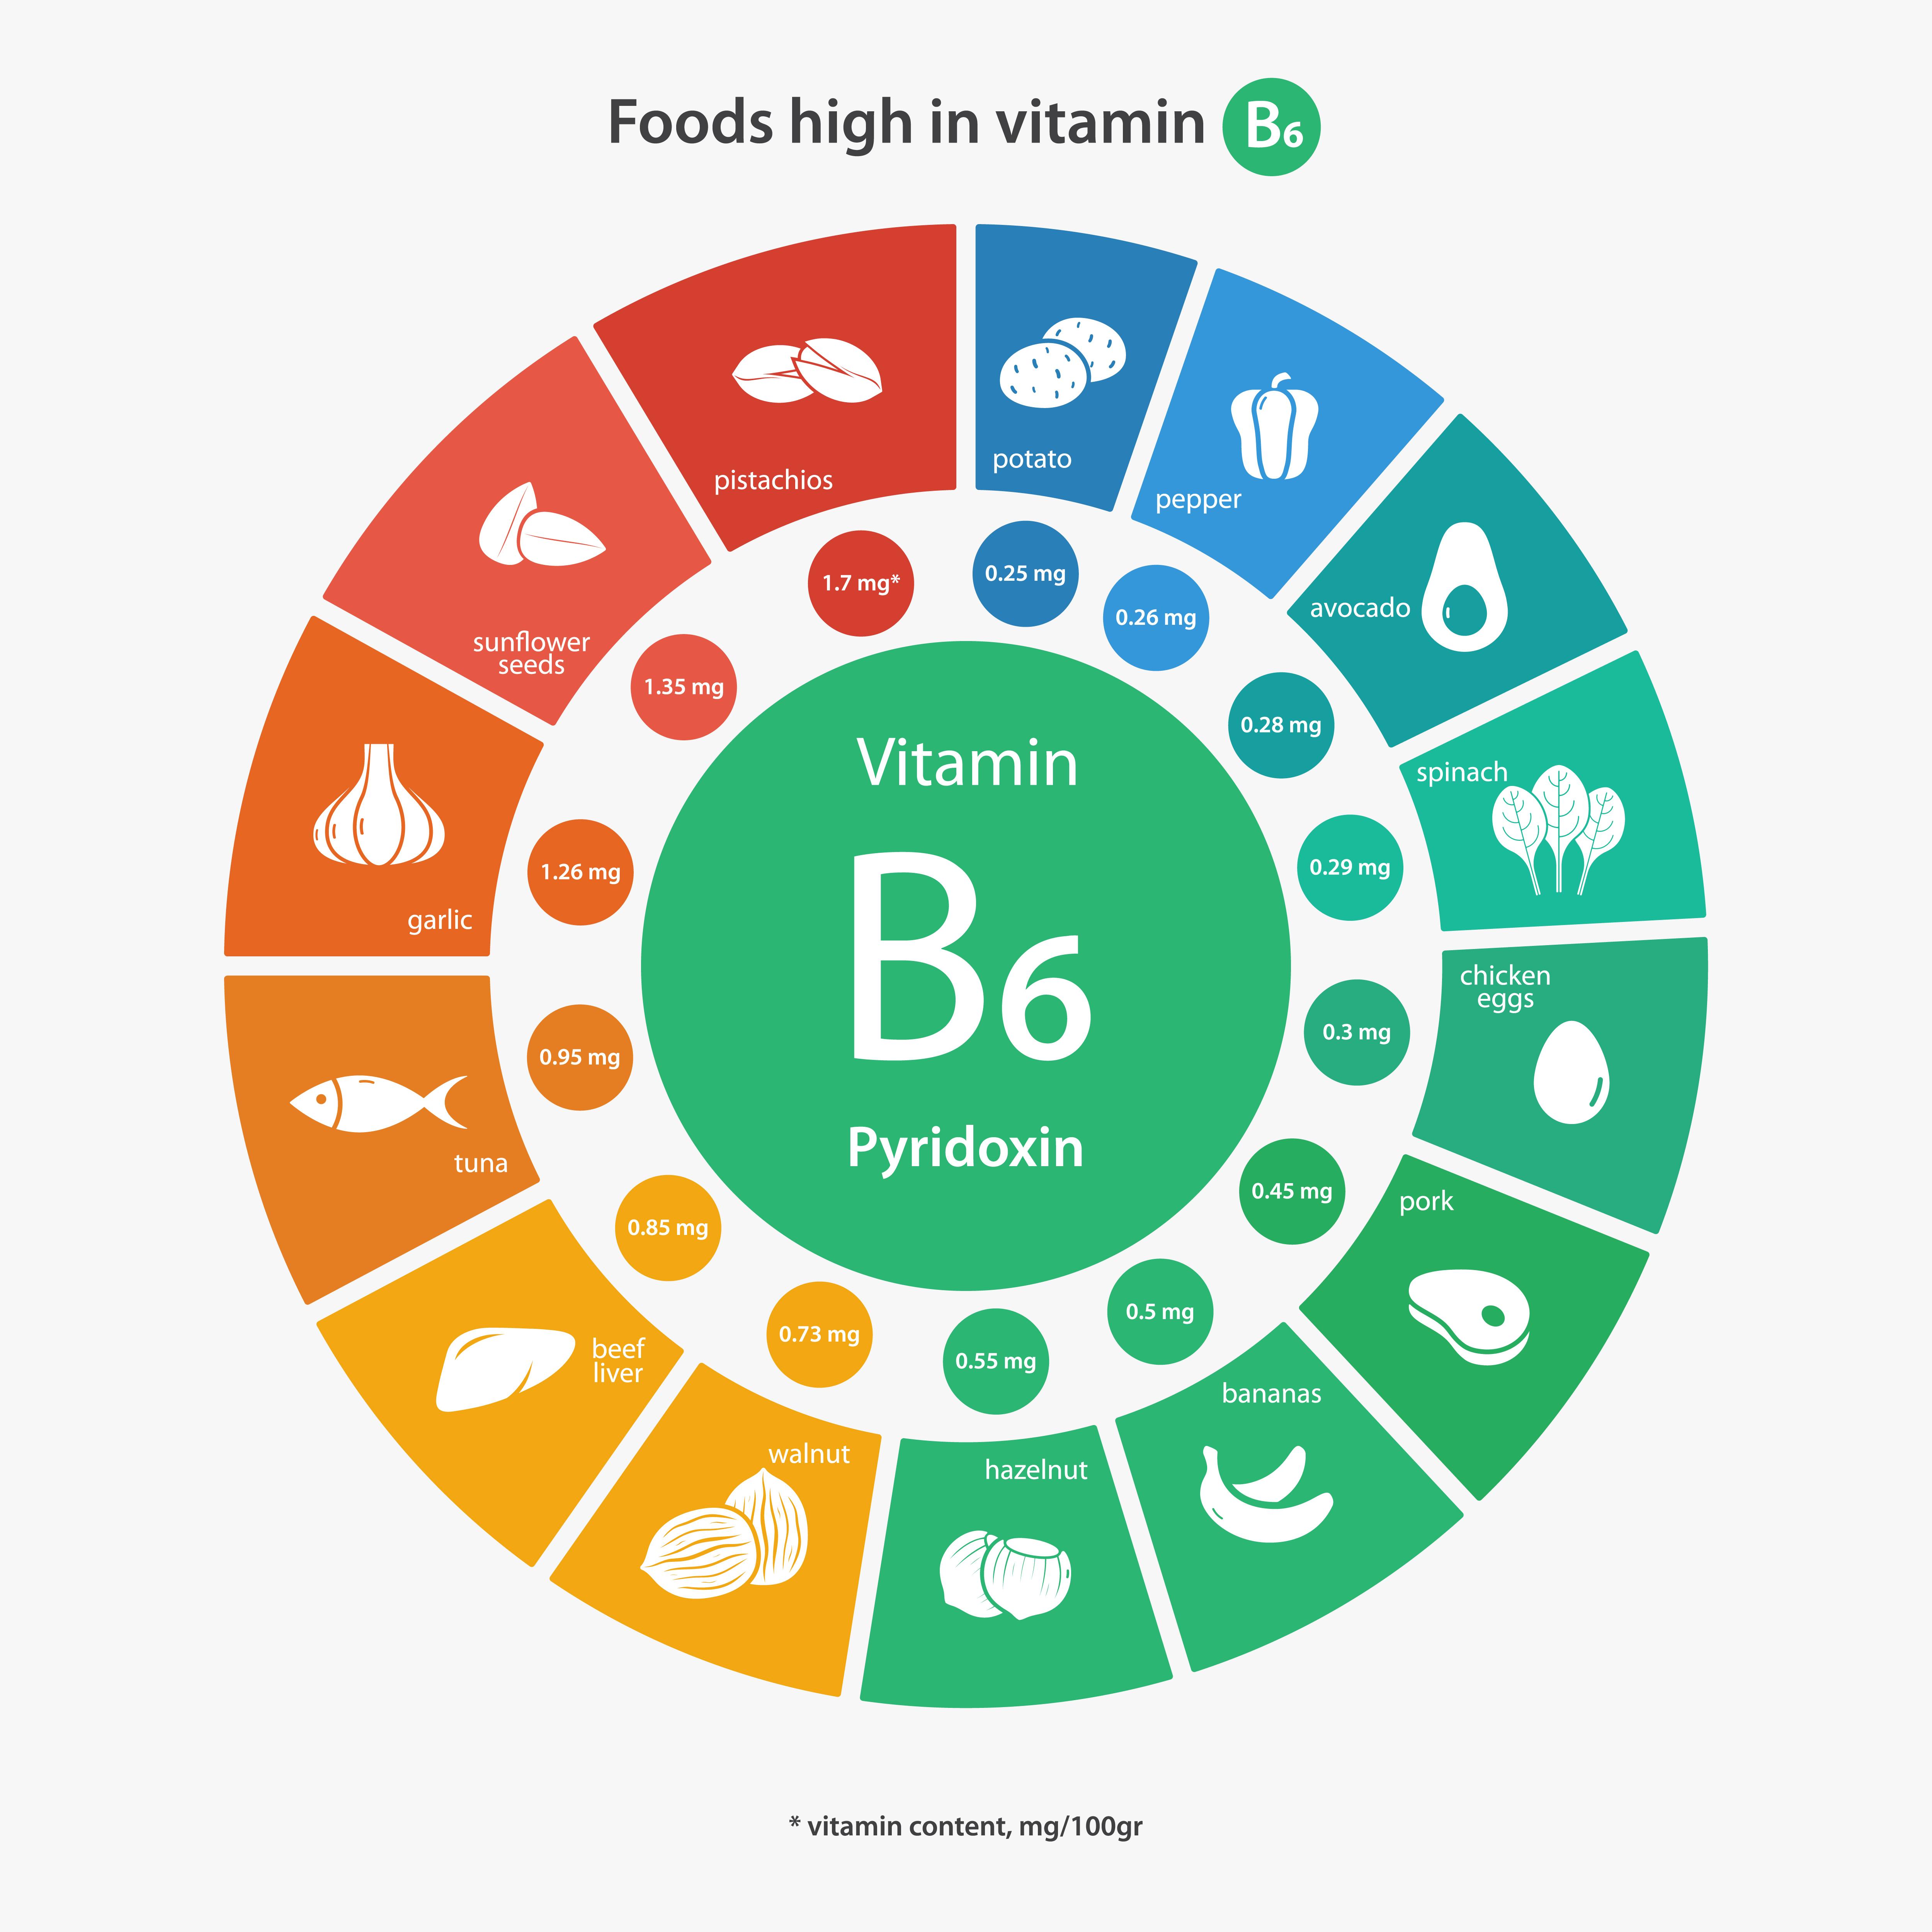 List Of Foods High In Vitamin B